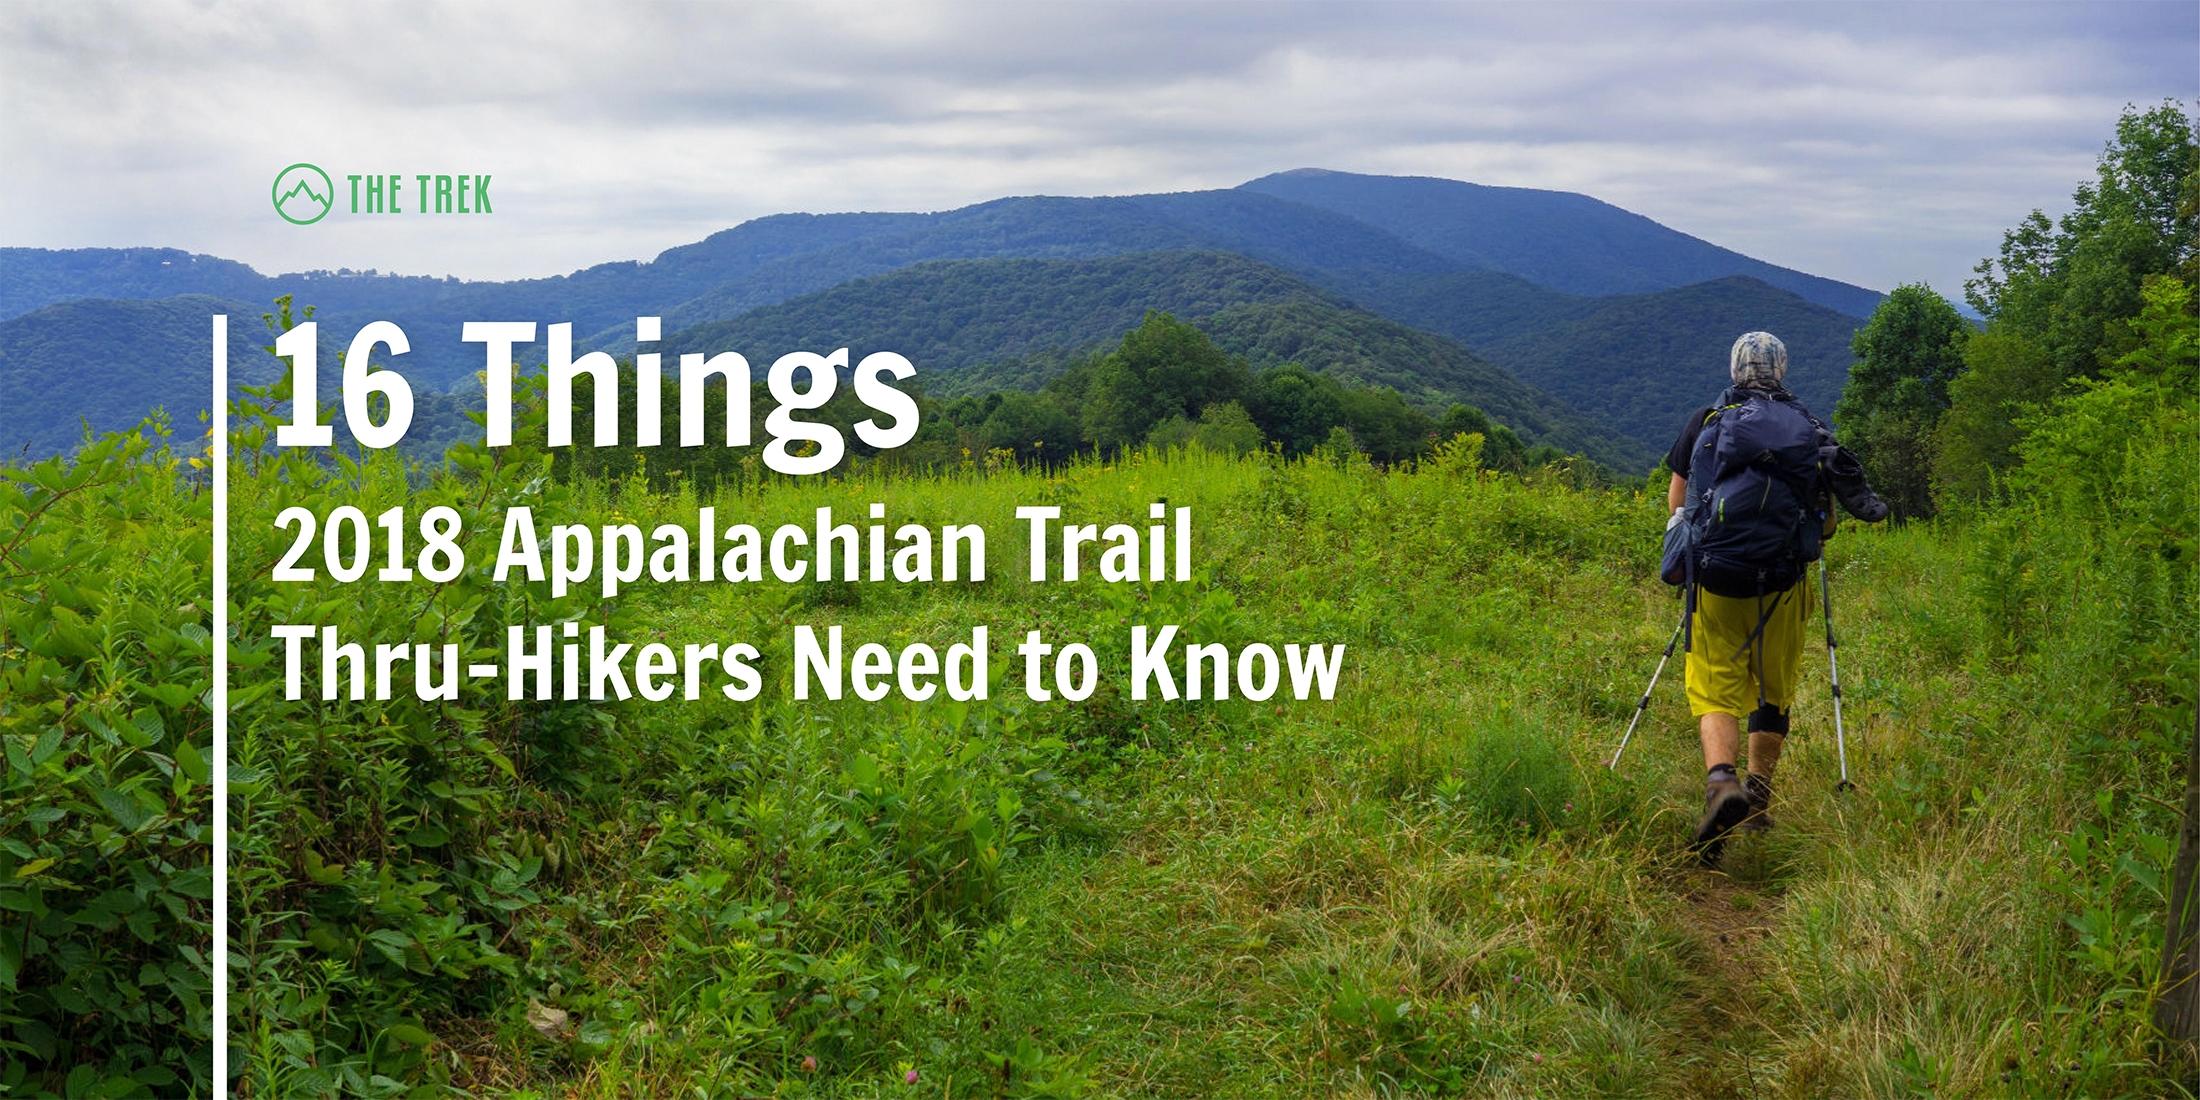 things-2018-thru-hikers-need-to-know.jpg